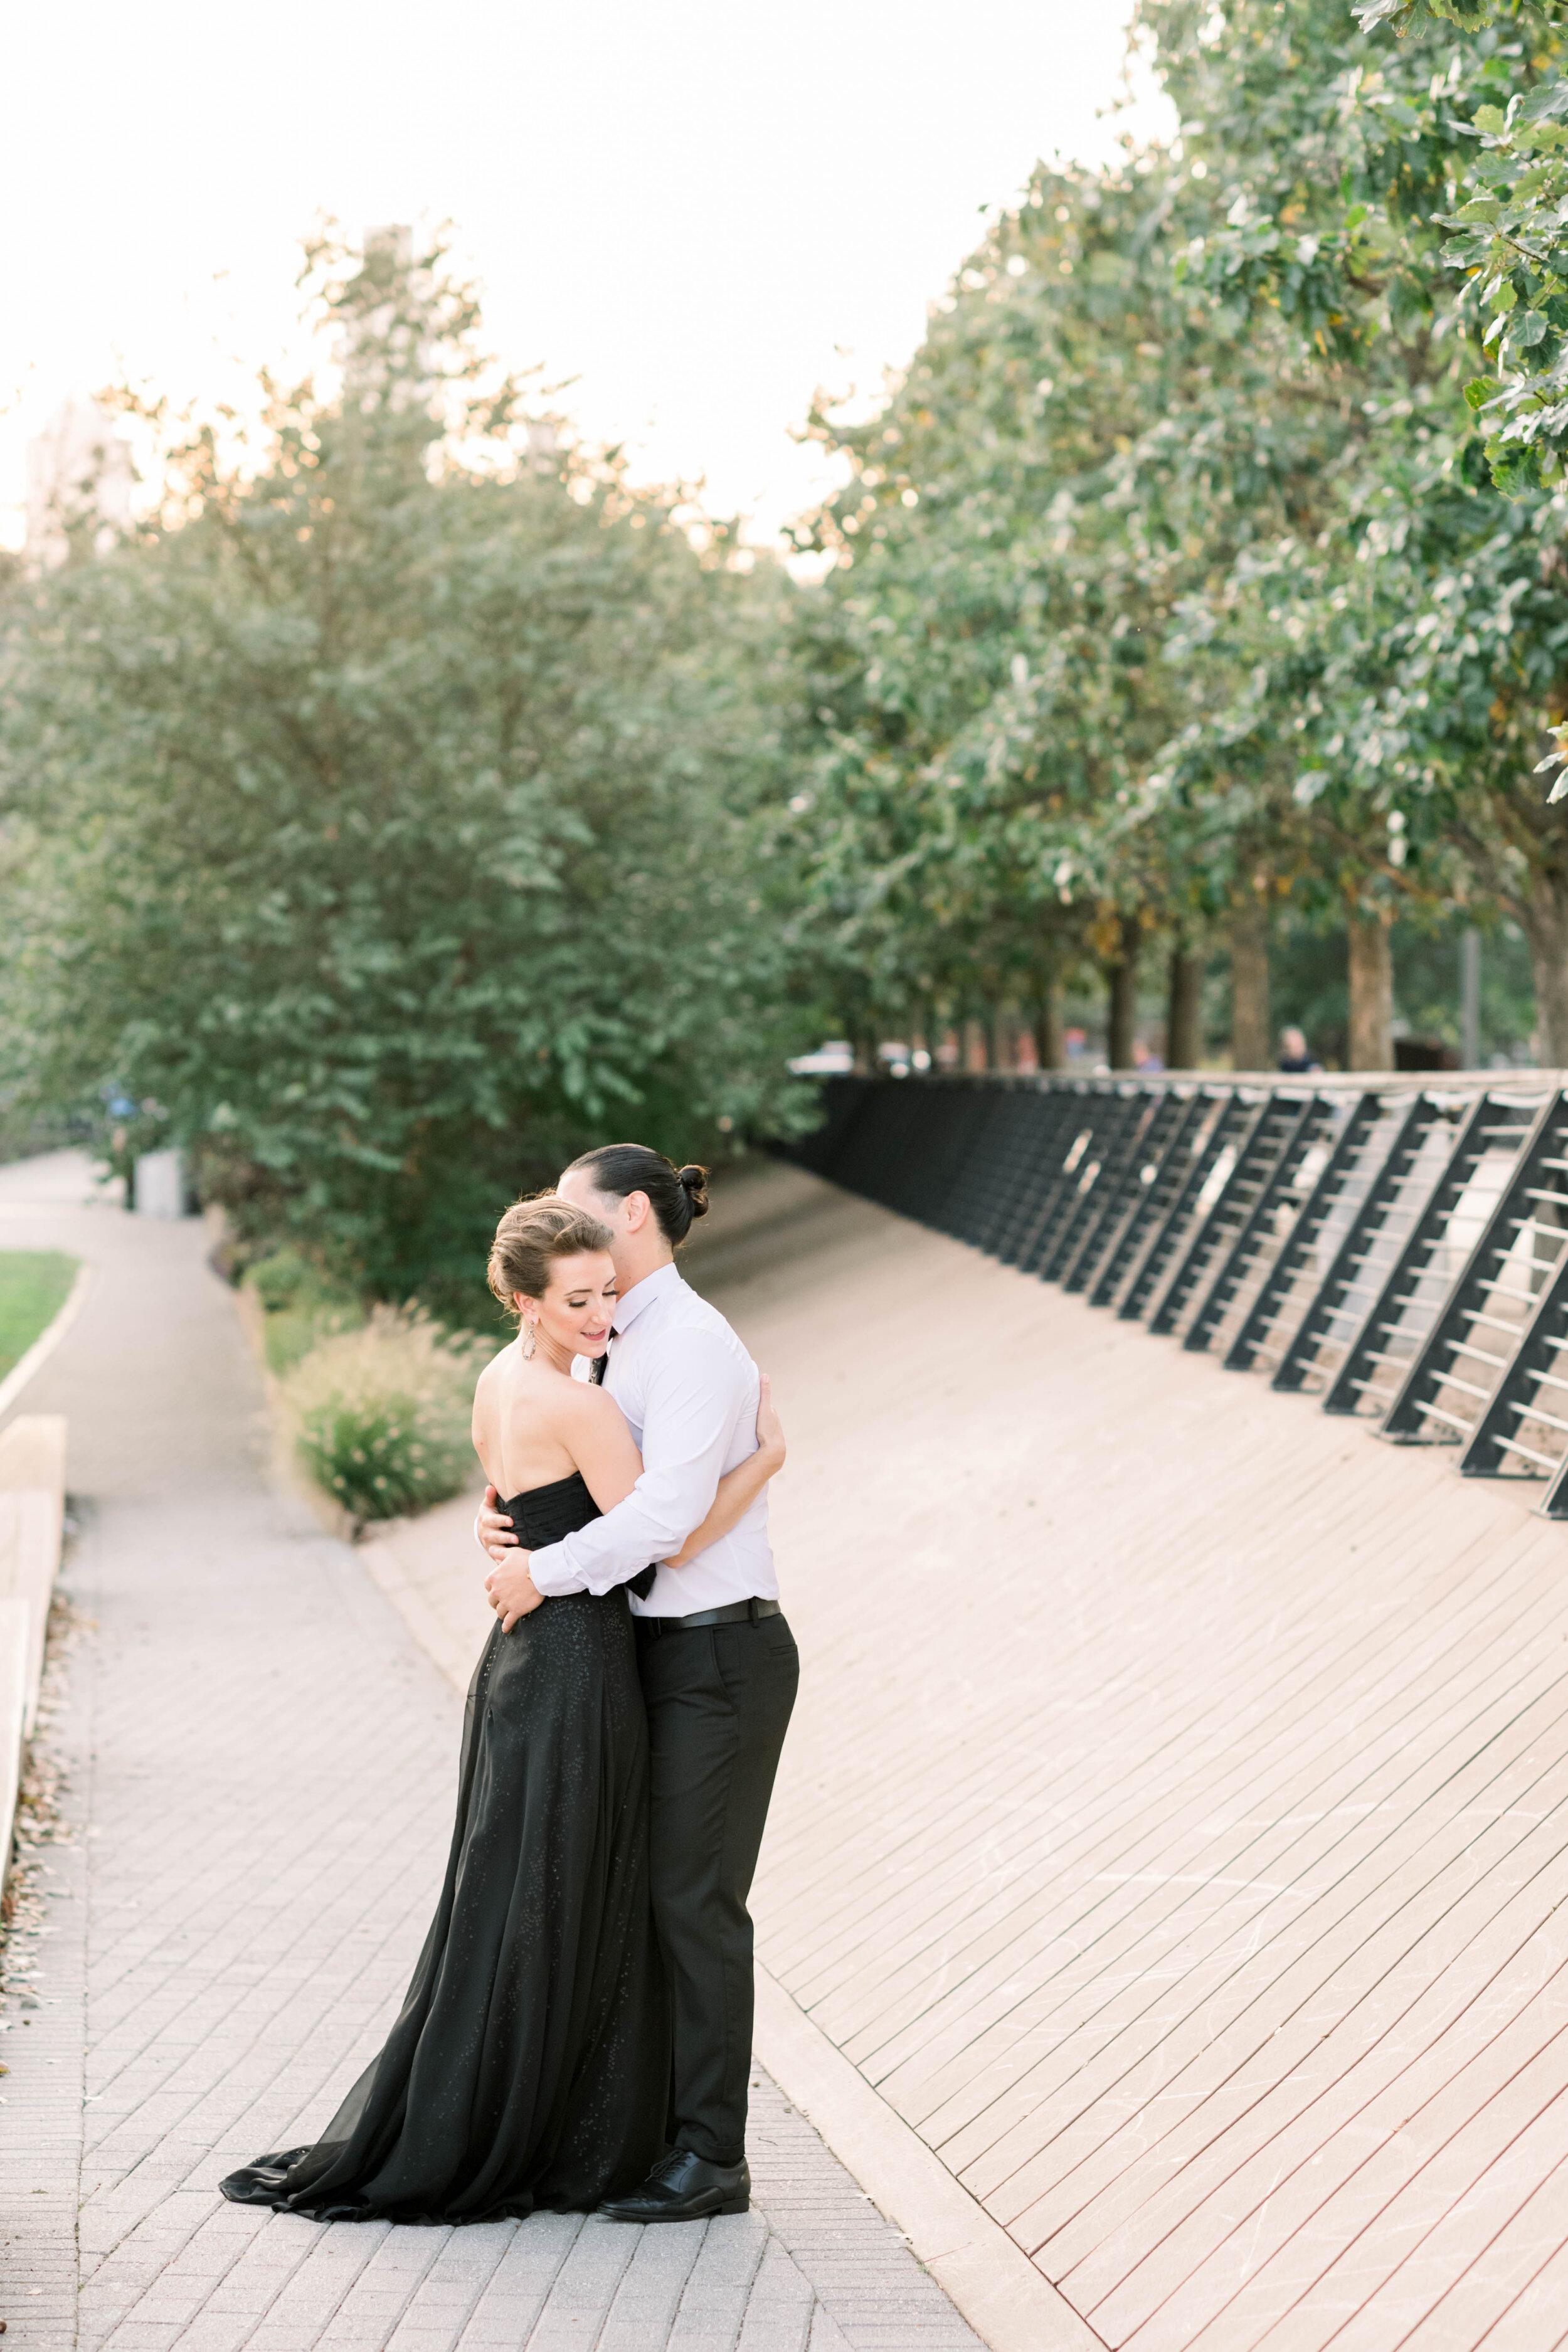 Philadelphia-sunset-engagement-shoot-race street pier--black dress-stylish couple-old city Philly-photo